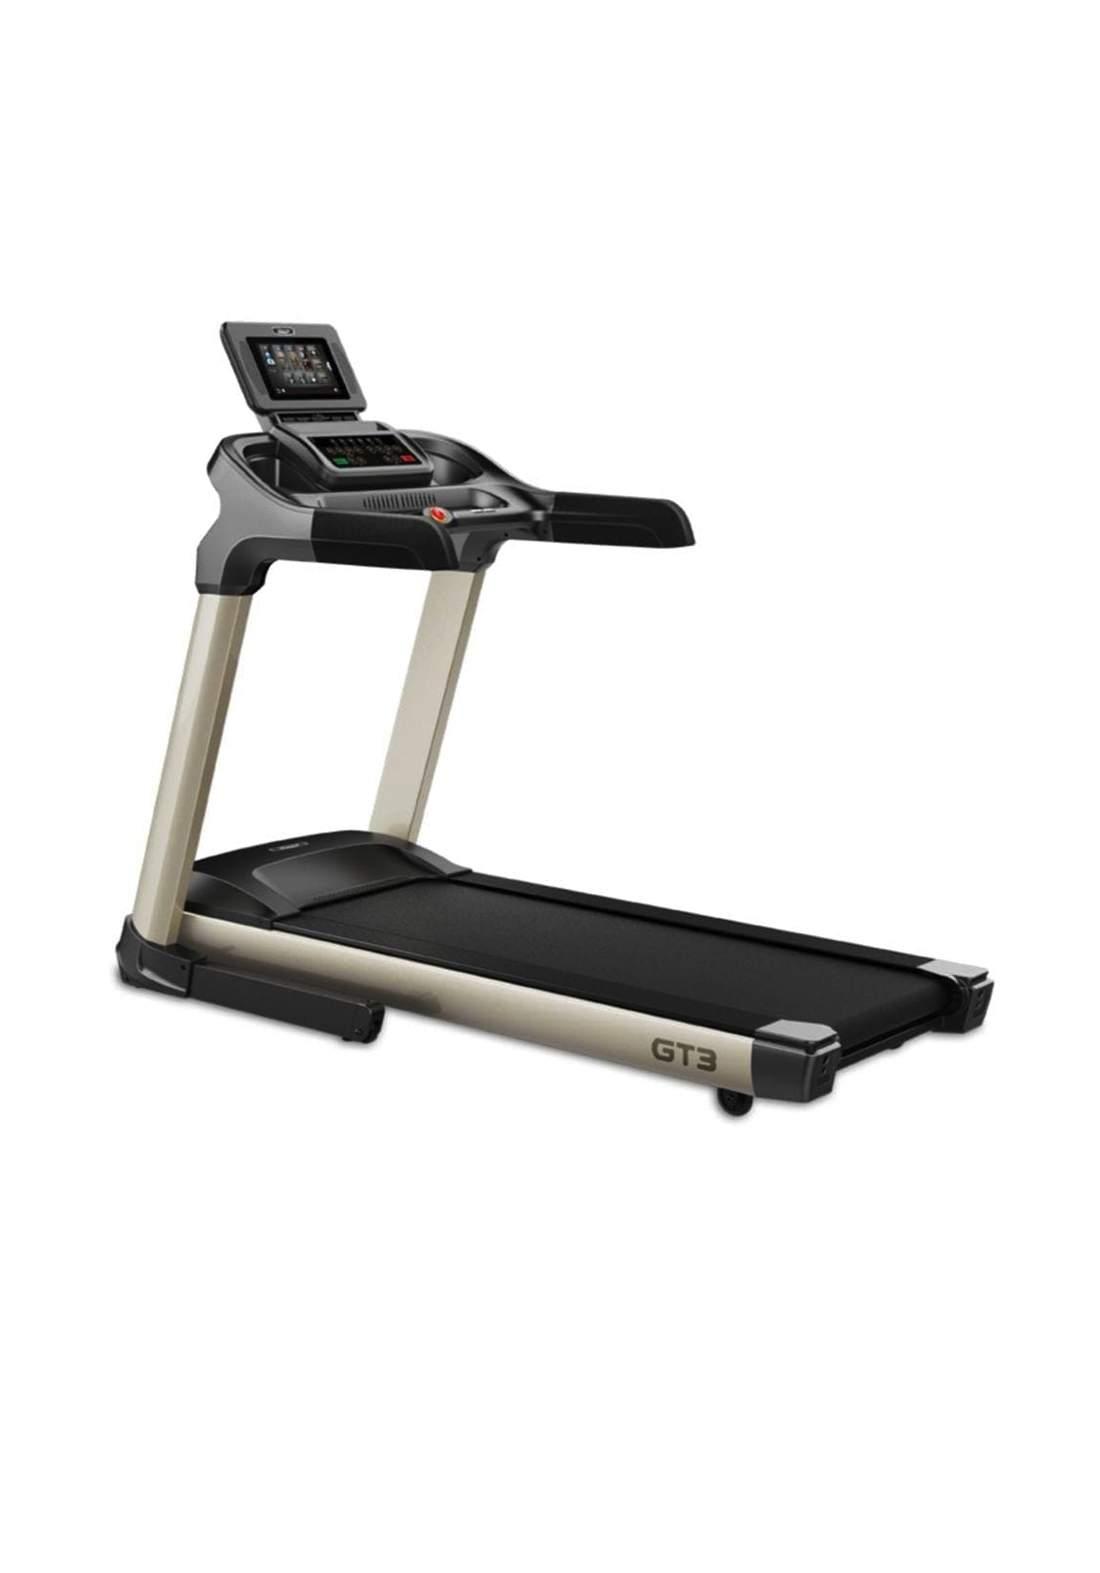 Daily Youth GT3A Treadmill  2*2  جهاز جري دبل ماطور